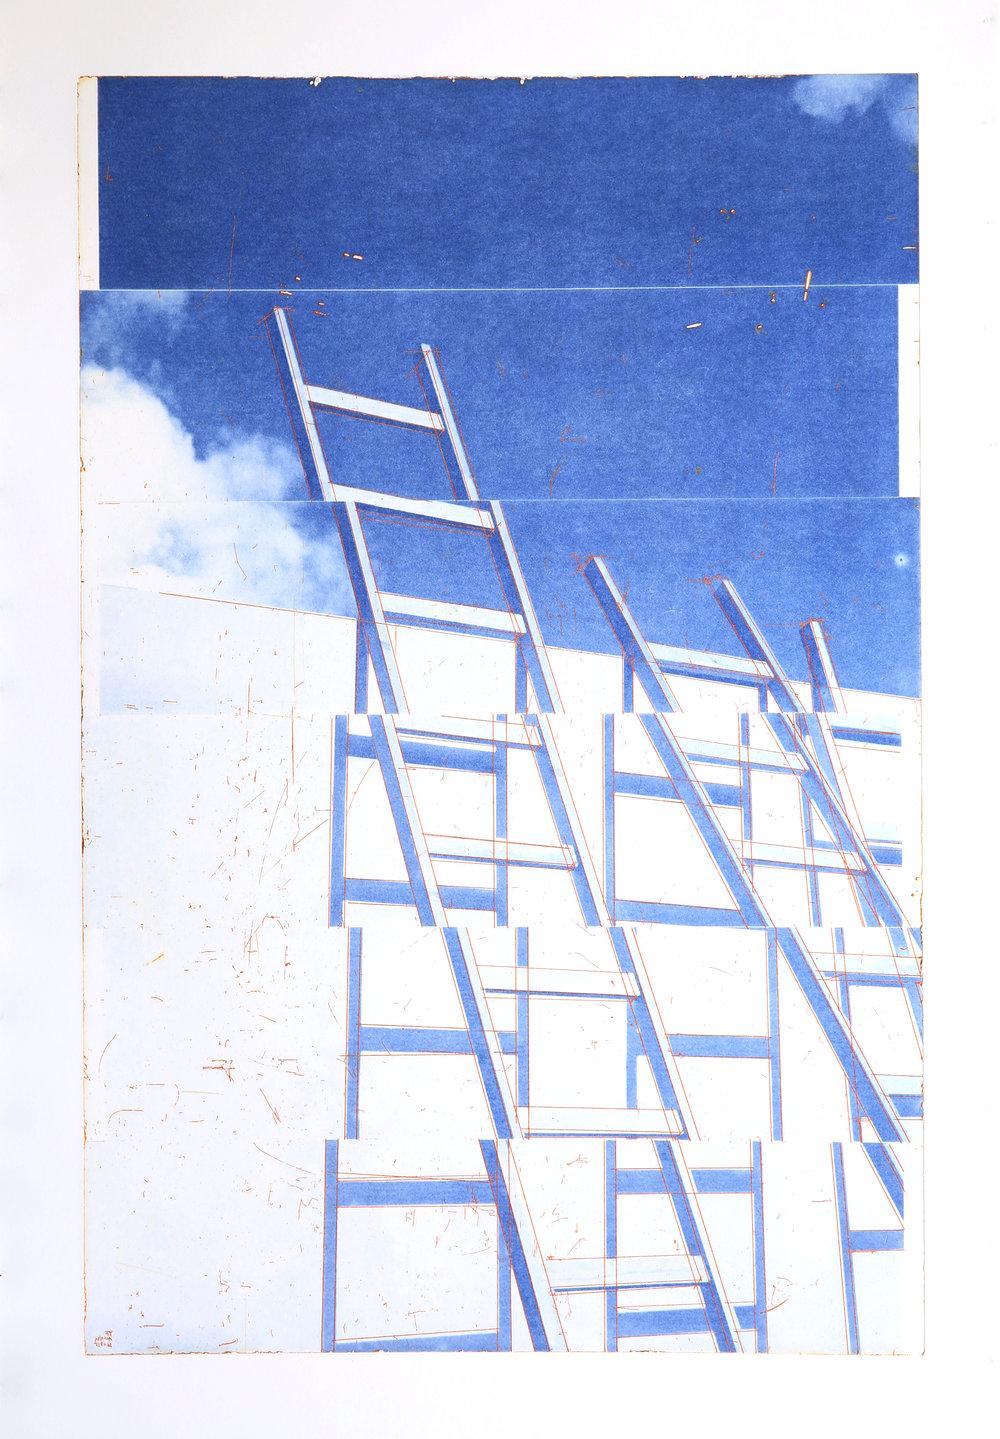 GHOSTPRINT: Venia / Intermezzo / Opportunity / The Wall   Polymer / Etching / Drypoint 160 x 110 cm / 63 x 43 in Edition of 45 + 7 Ap Editeur: Per Fronth / Atelje Ole Larsen / Helsingborg  24/2015: